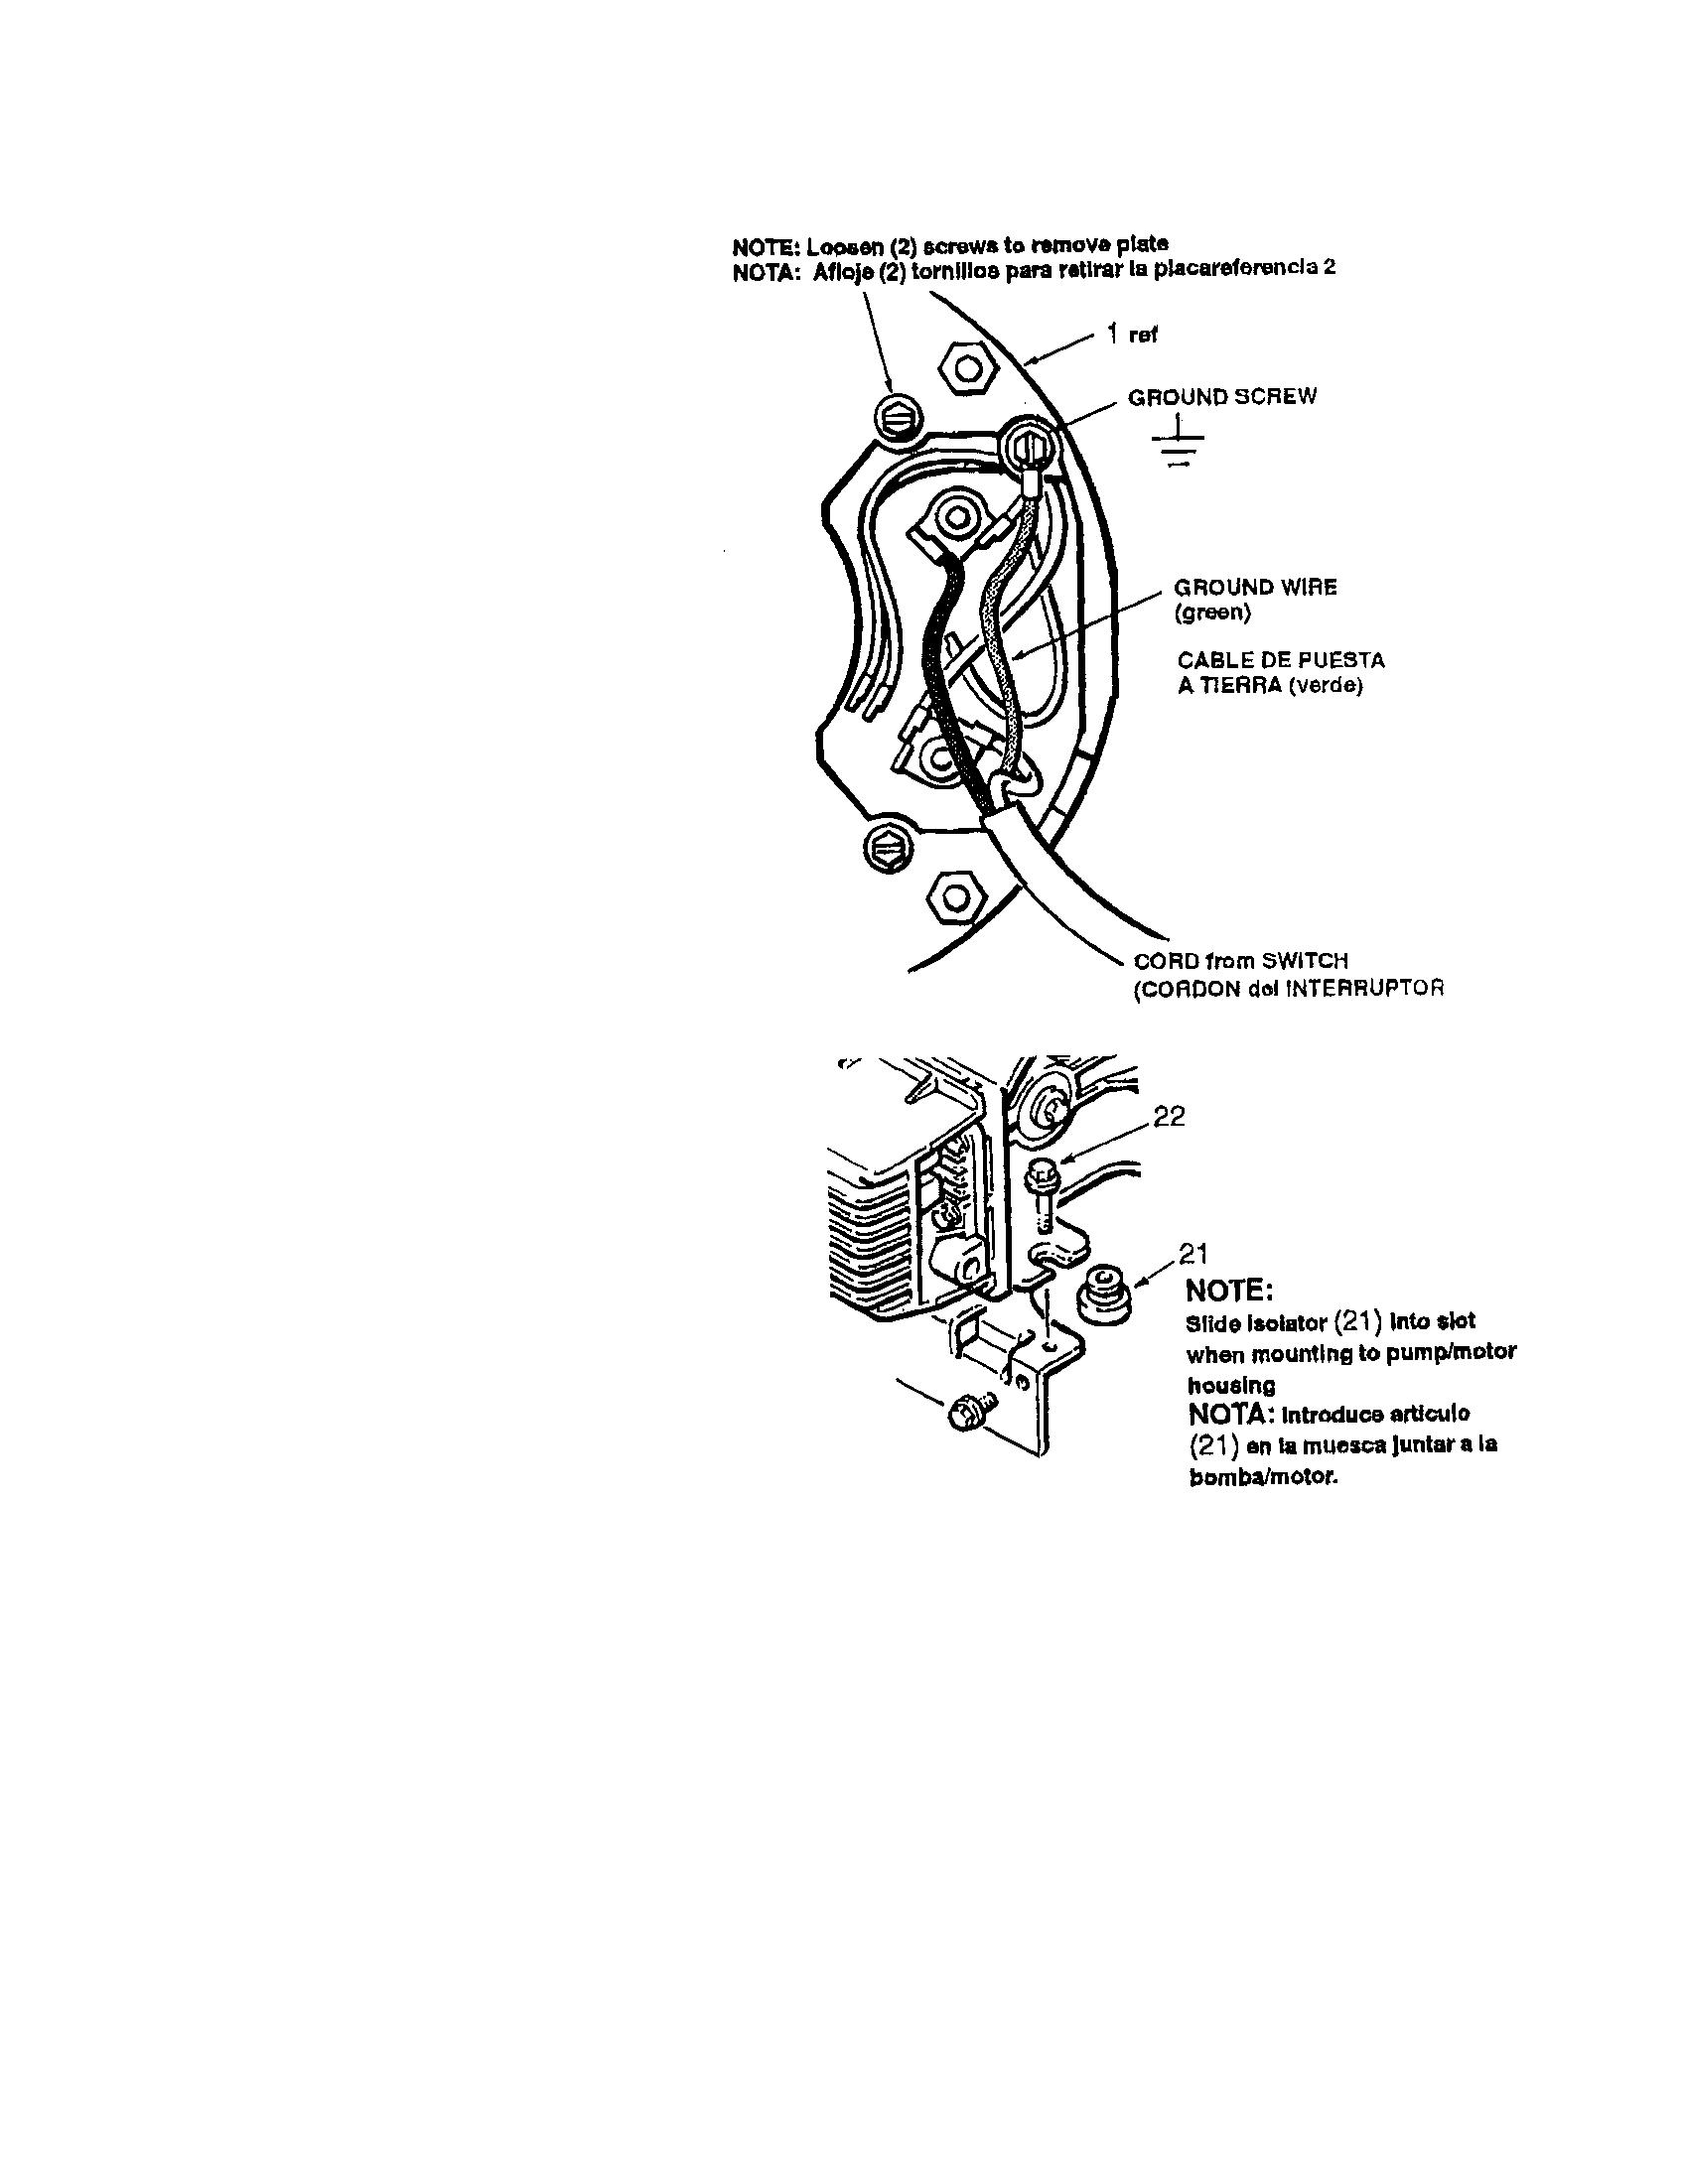 Wiring Diagram For Sanborn Air Compressor